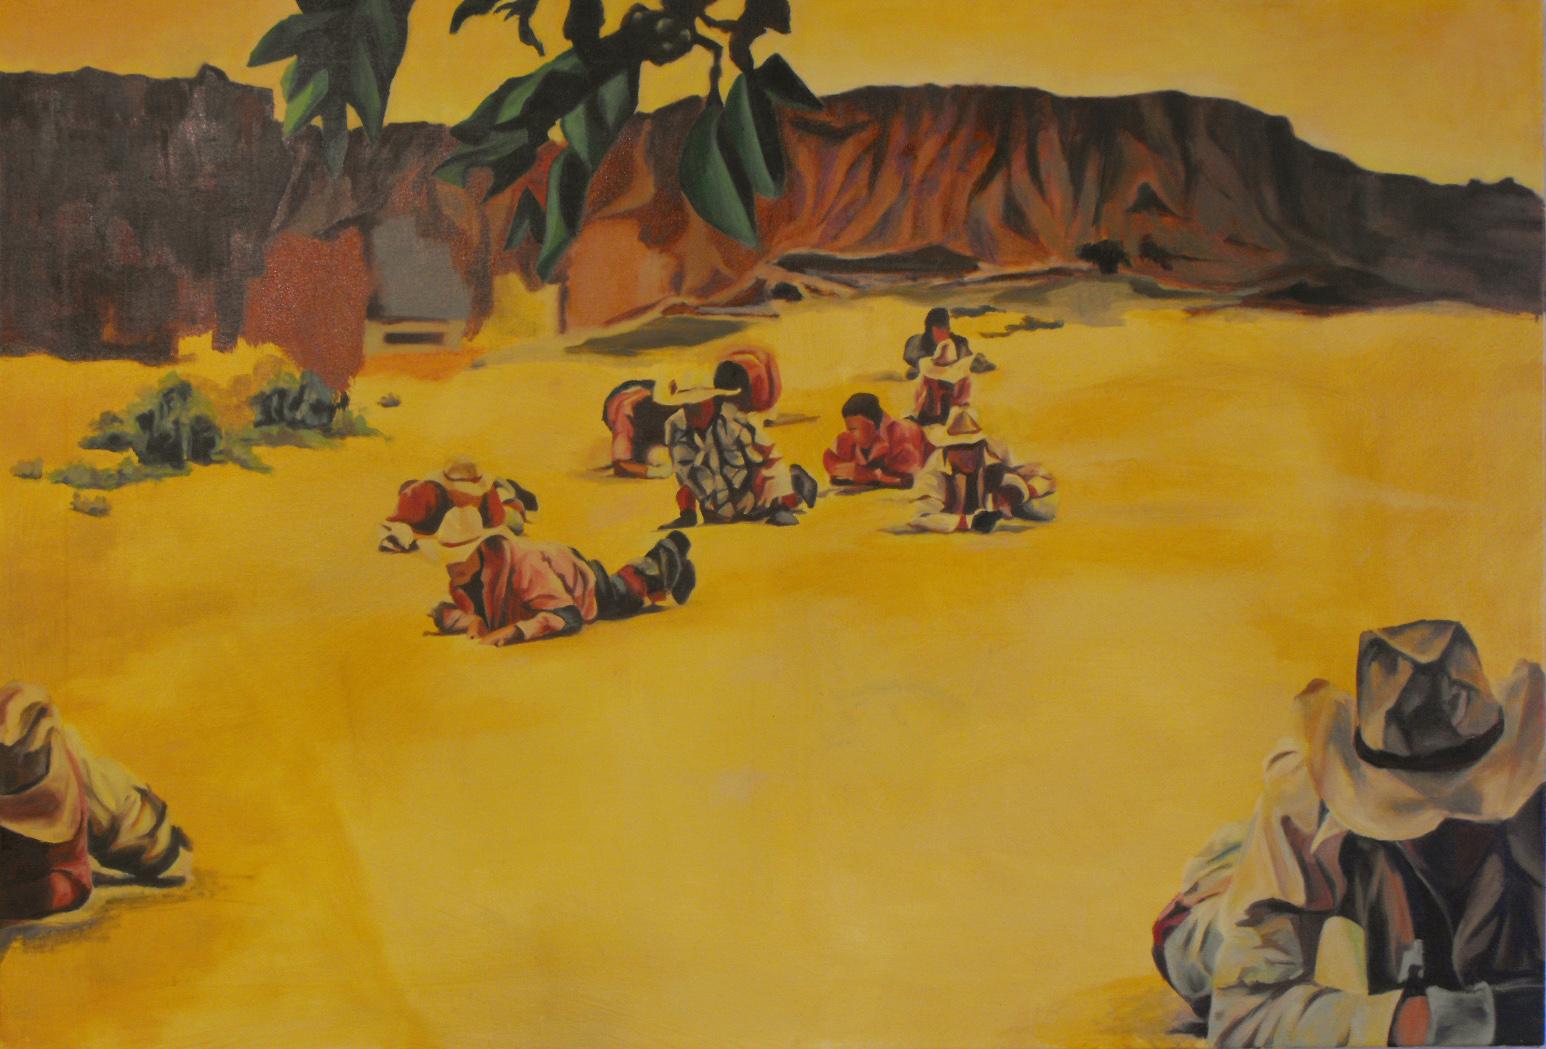 """Crawl"", Oil on canvas, 110x75, 2014"